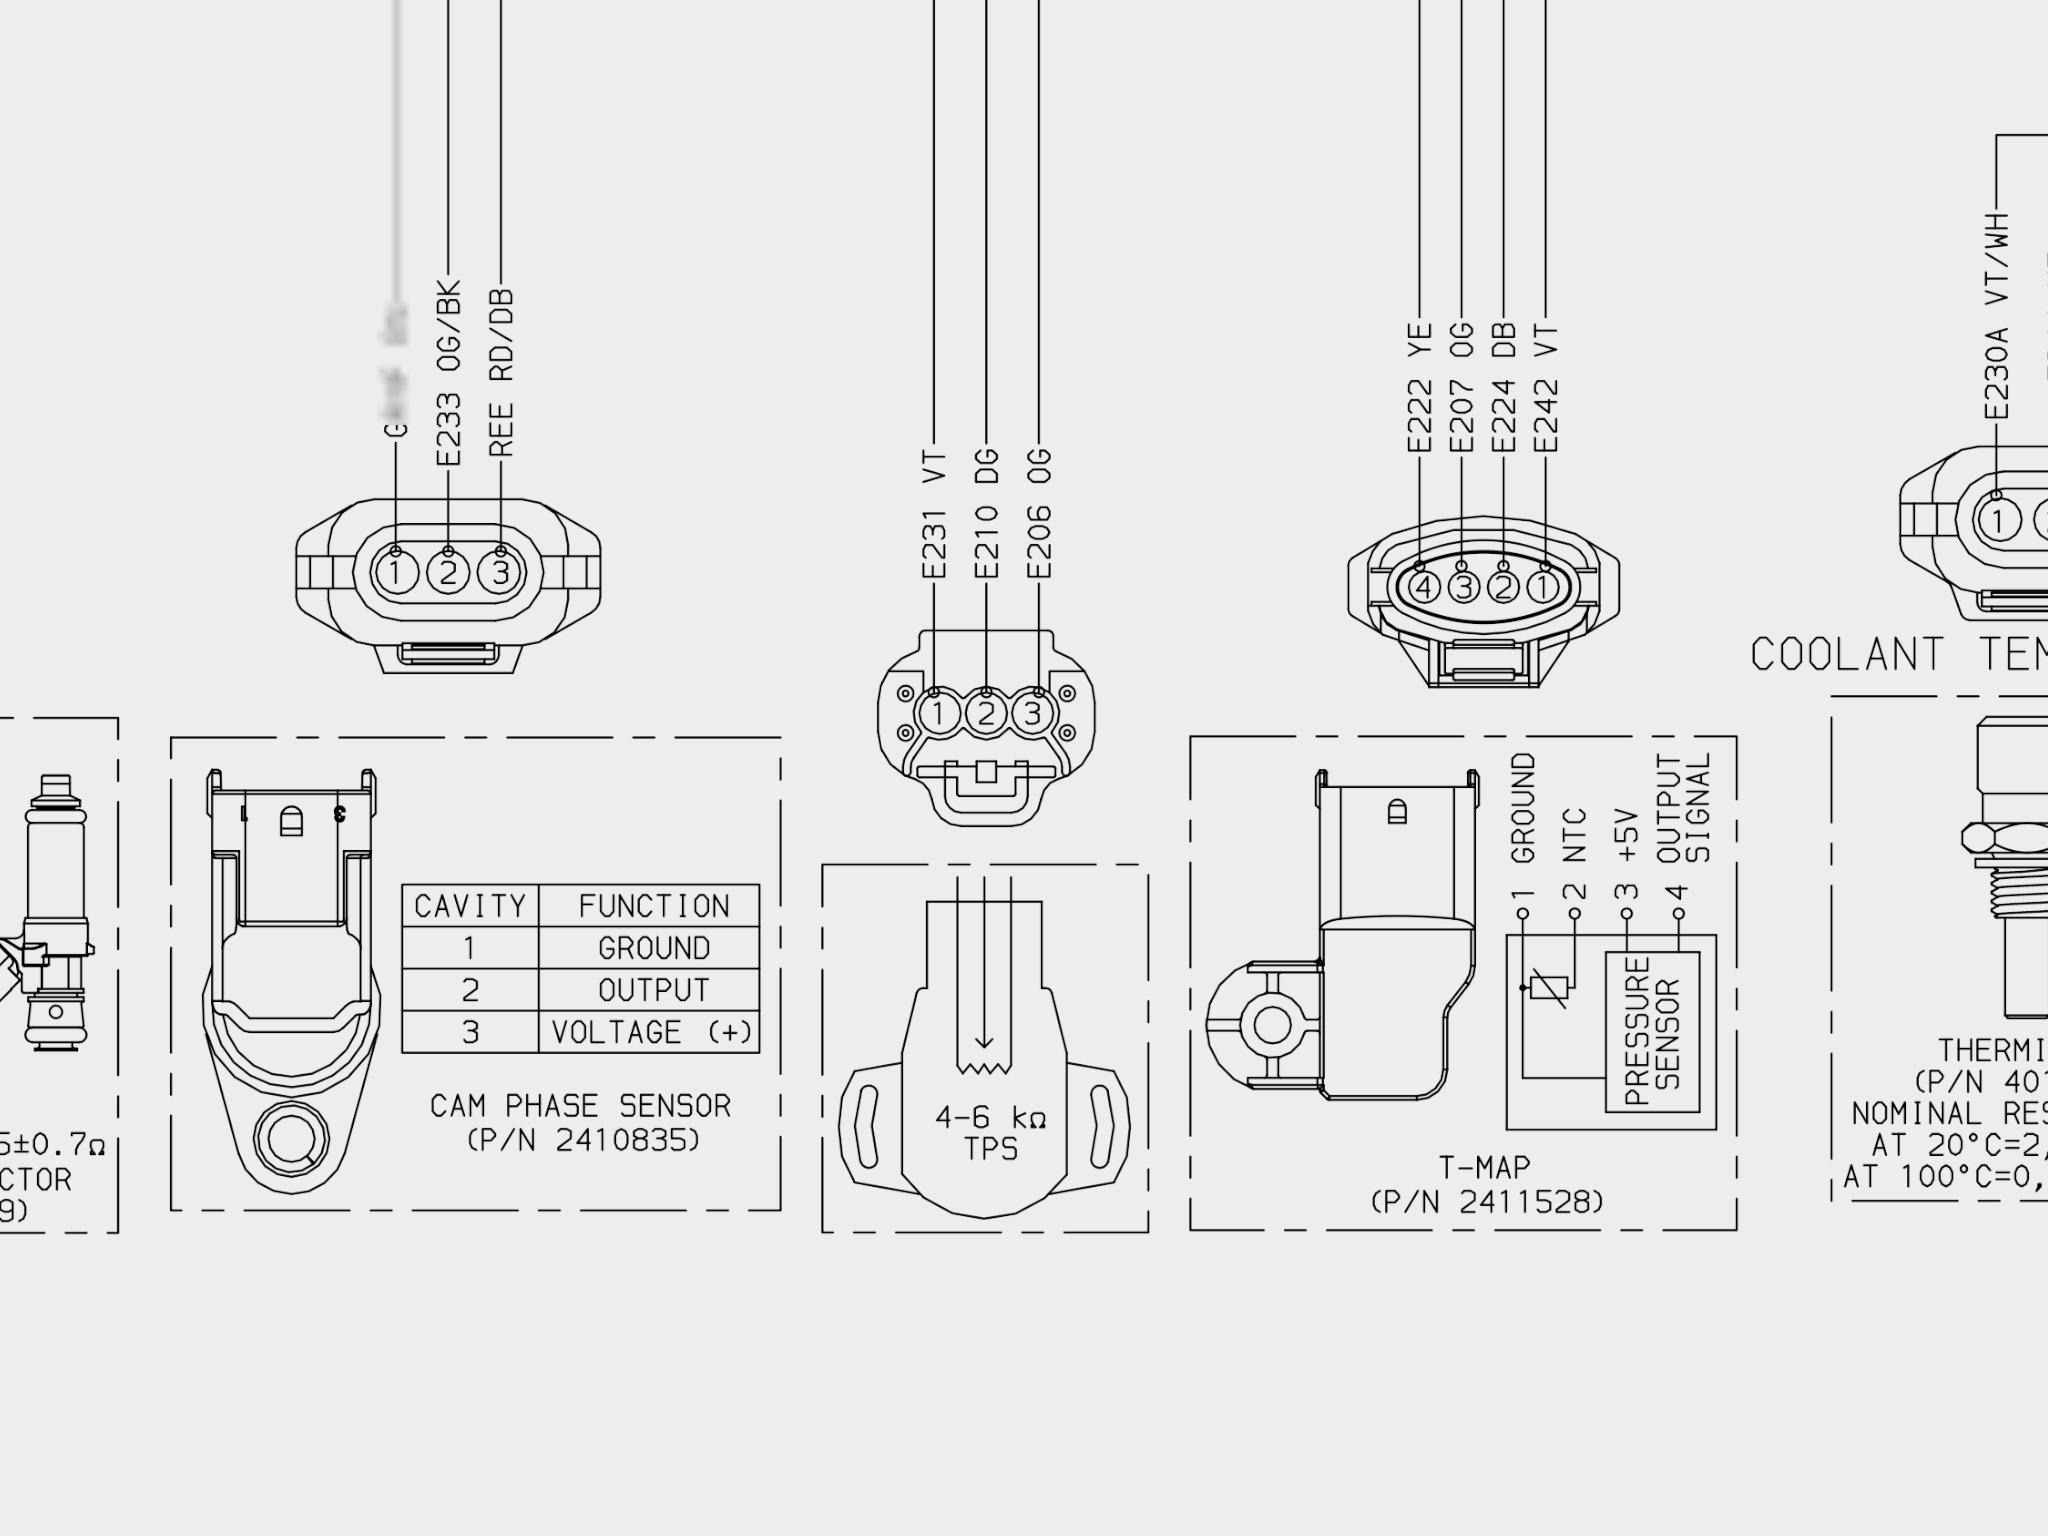 tps wiring for ranger circuits symbols diagrams u2022 rh amdrums co uk